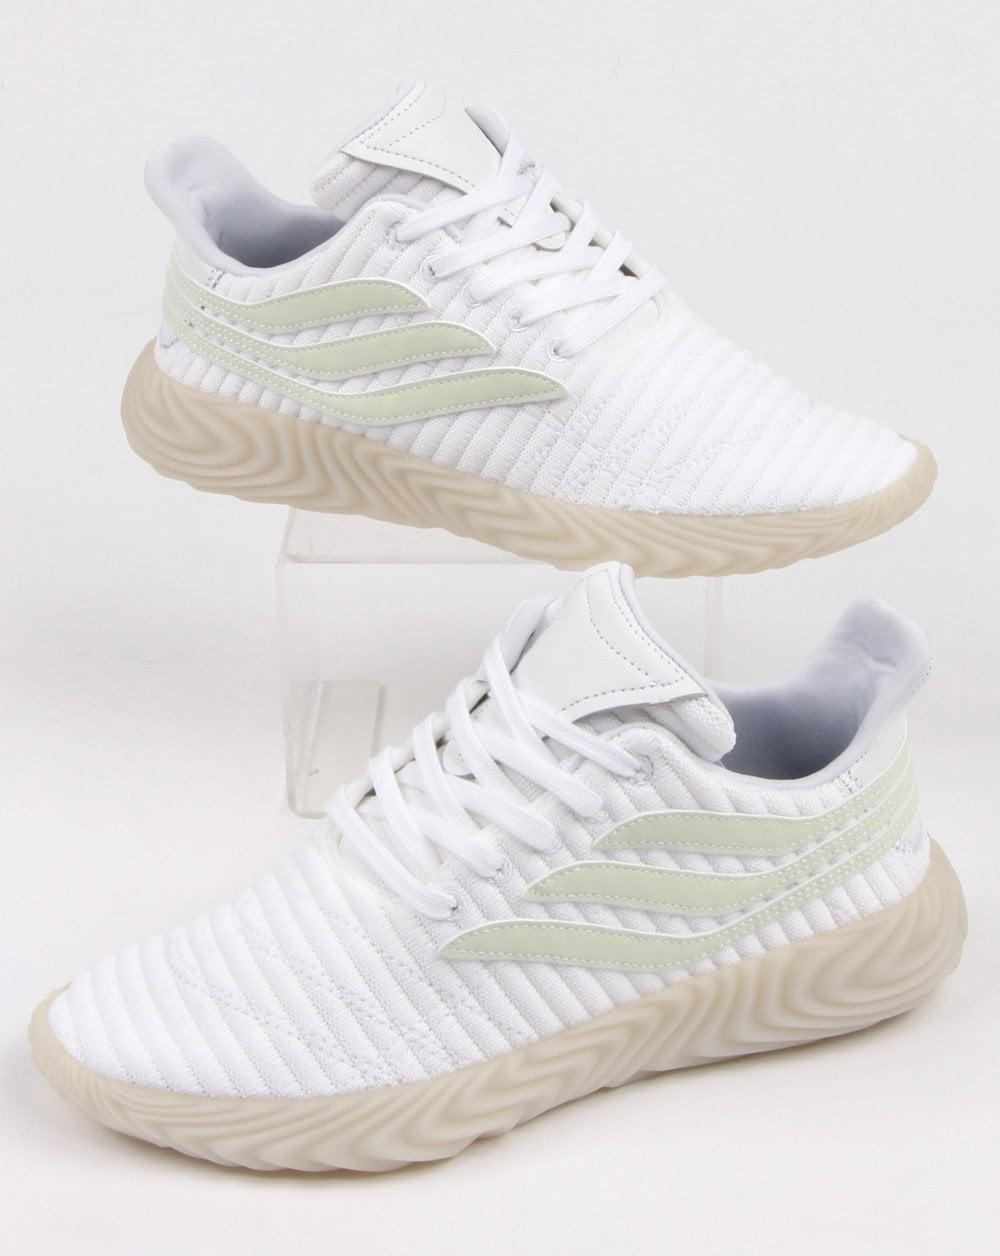 the best attitude f589c 1d84c adidas Trainers Adidas Sobakov Trainers White aero Green